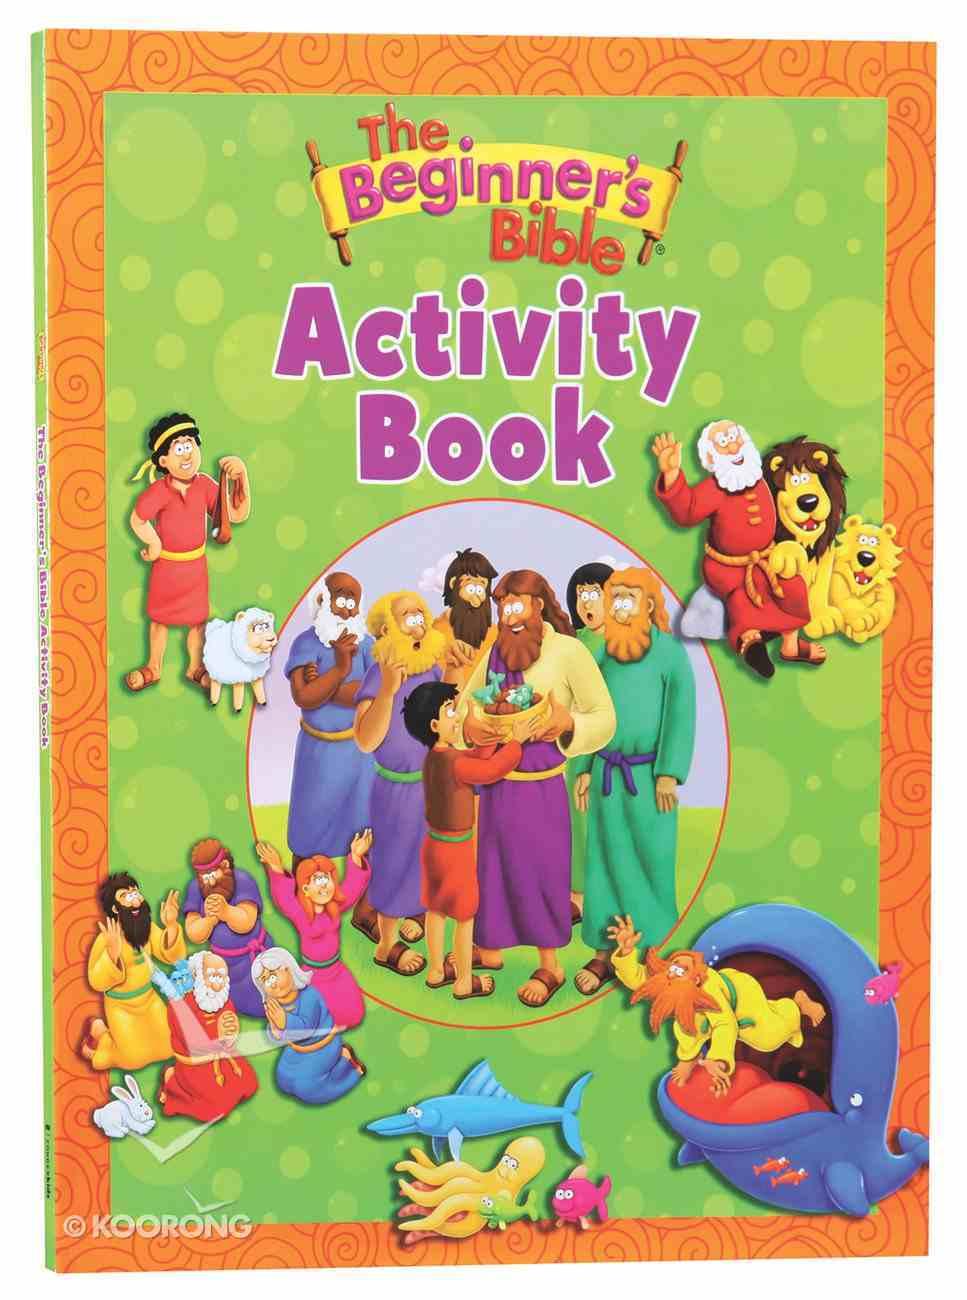 The Beginner's Bible Activity Book Paperback